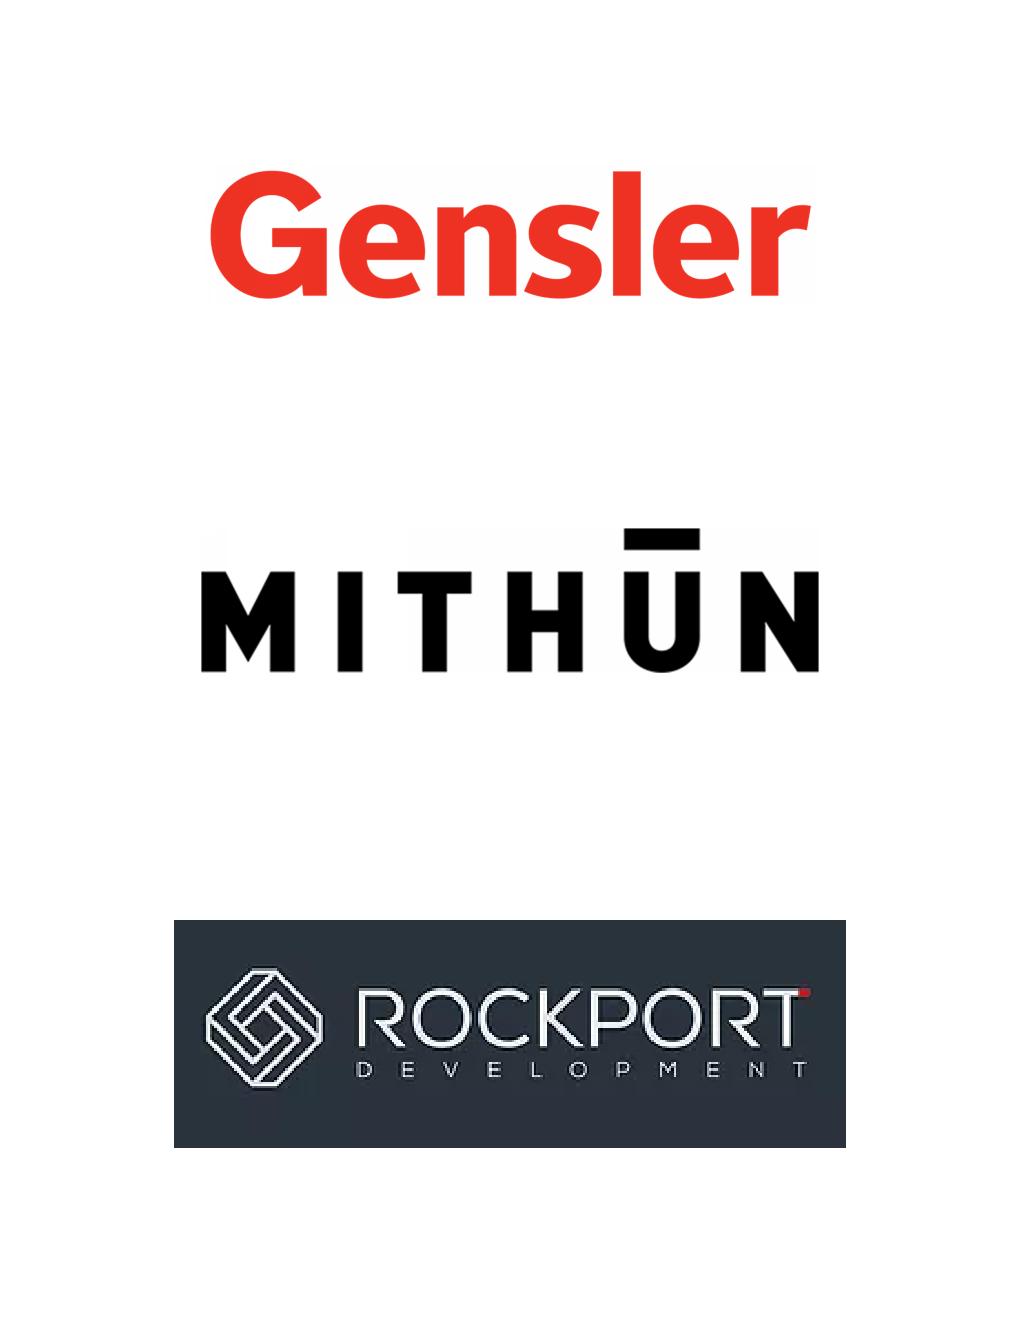 Client Logos 5.png